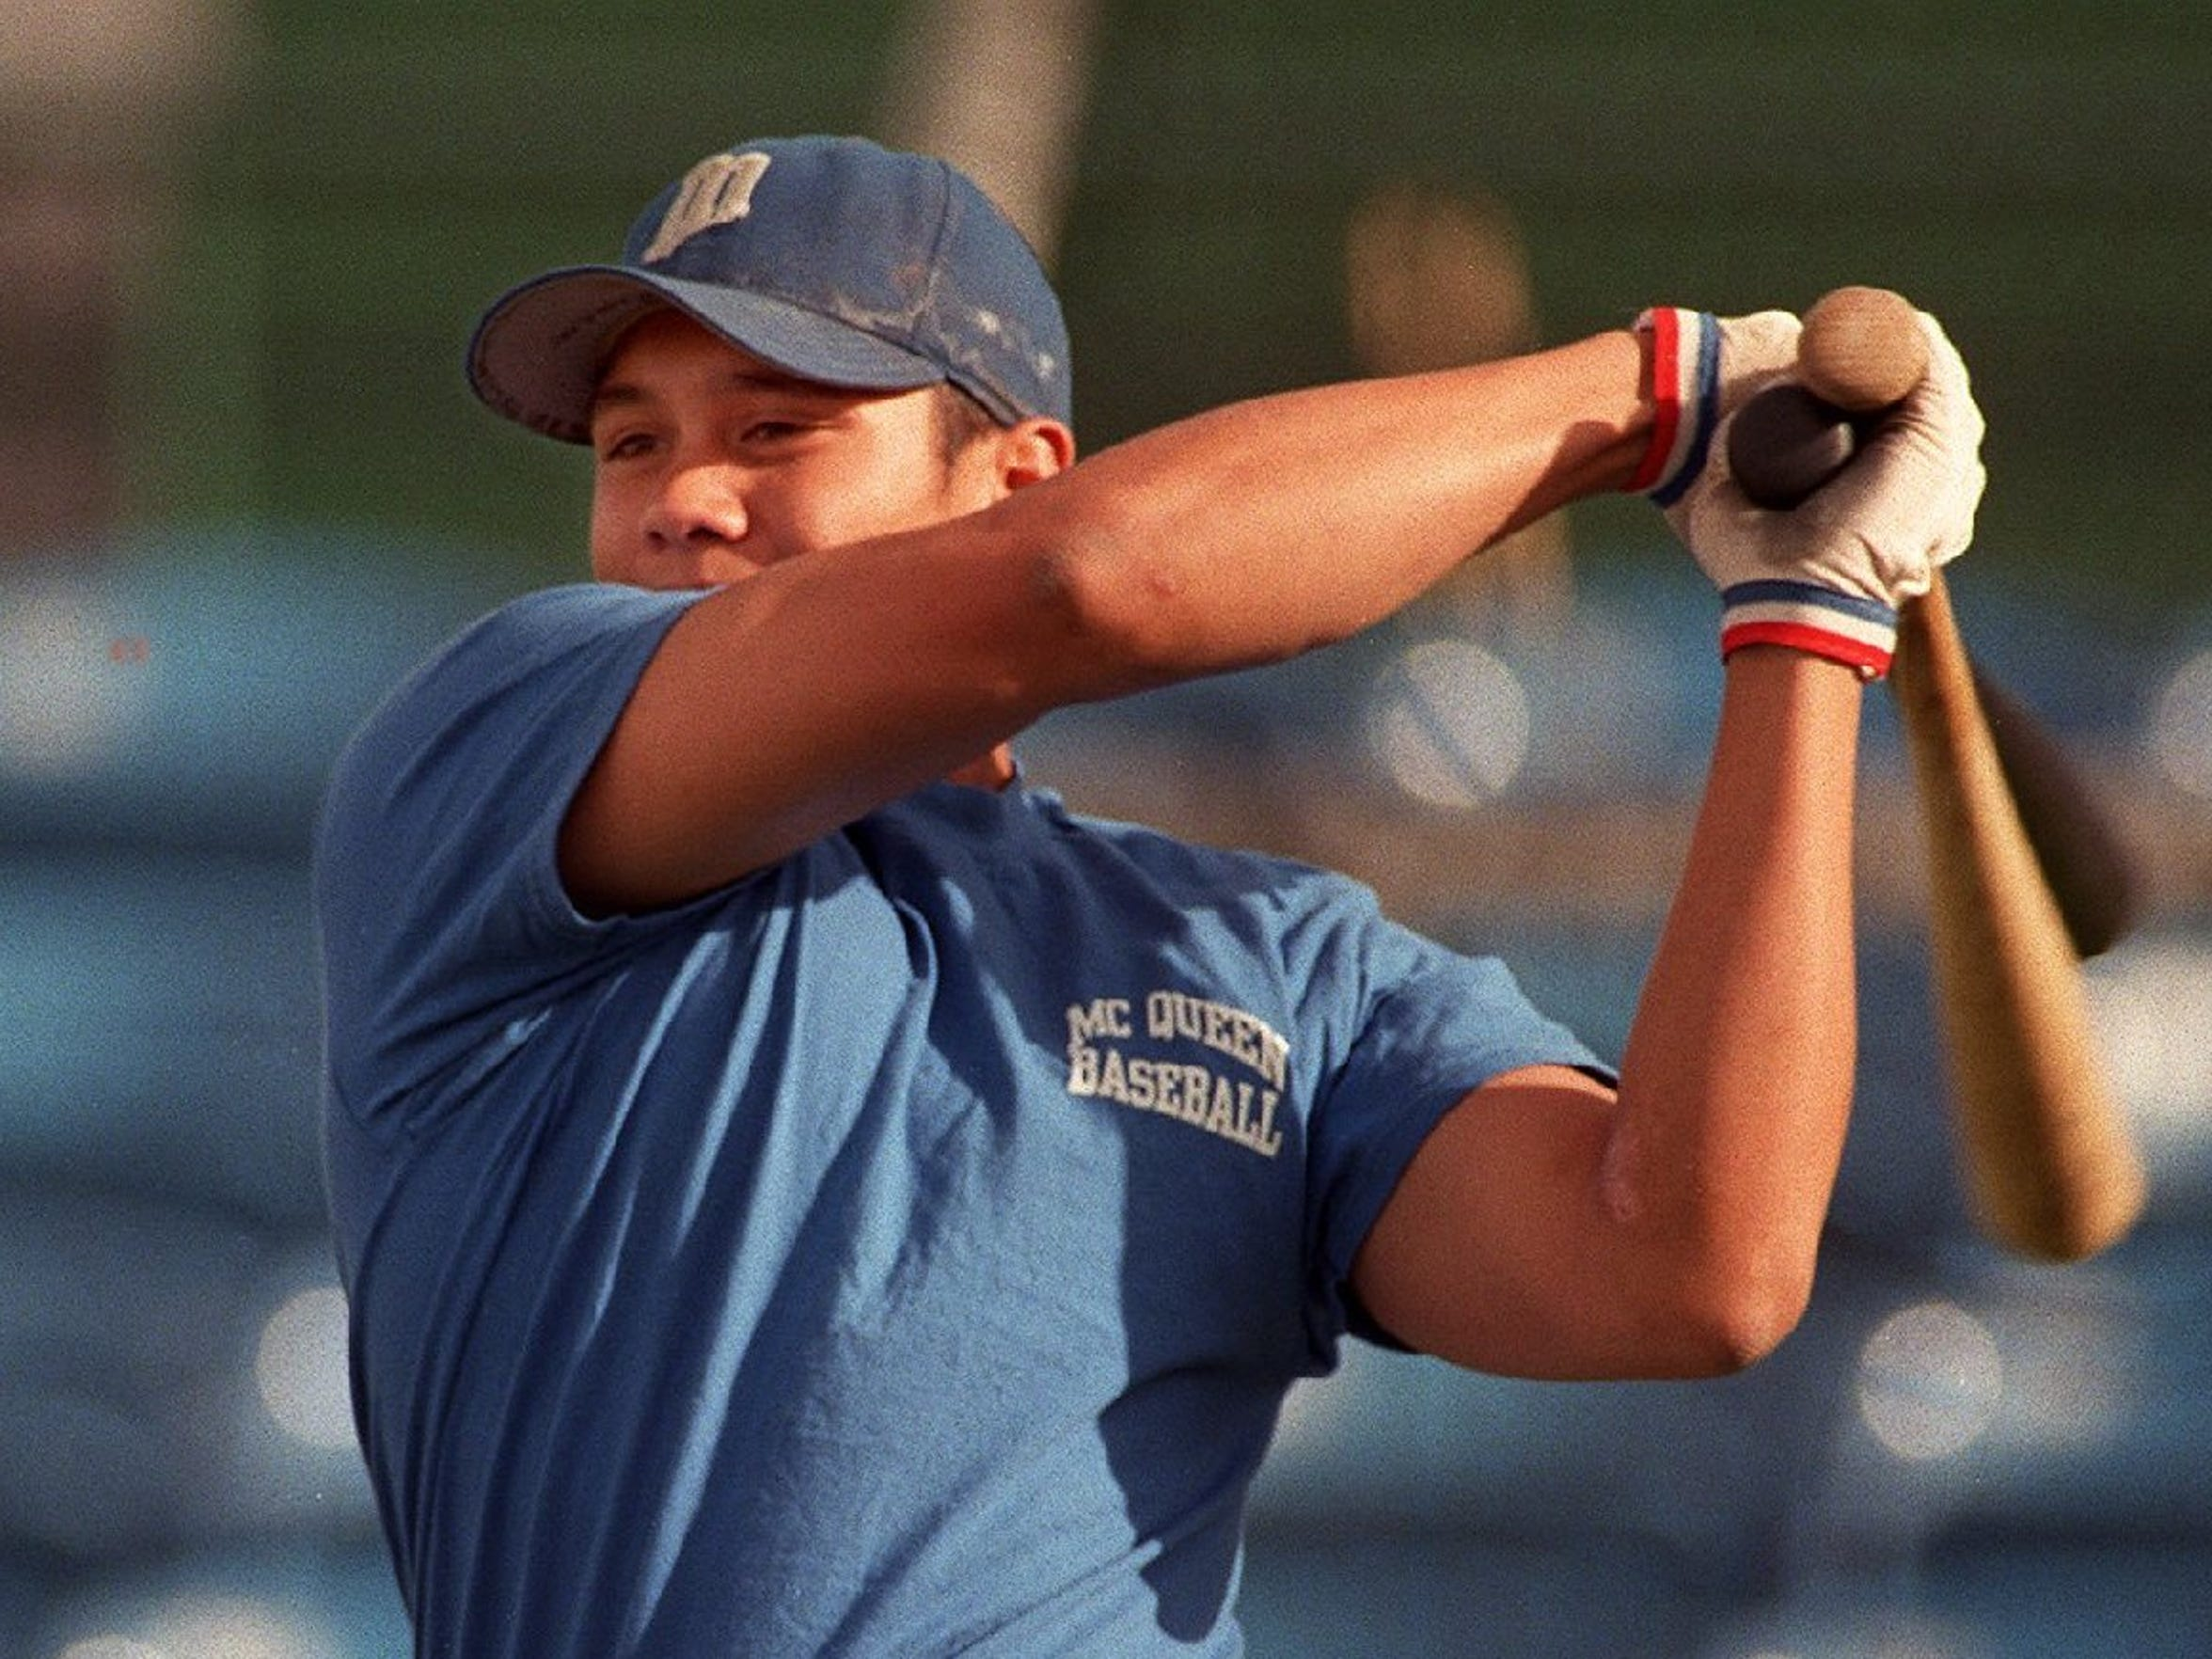 McQueen's Chris Aguila tied the national prep single-season